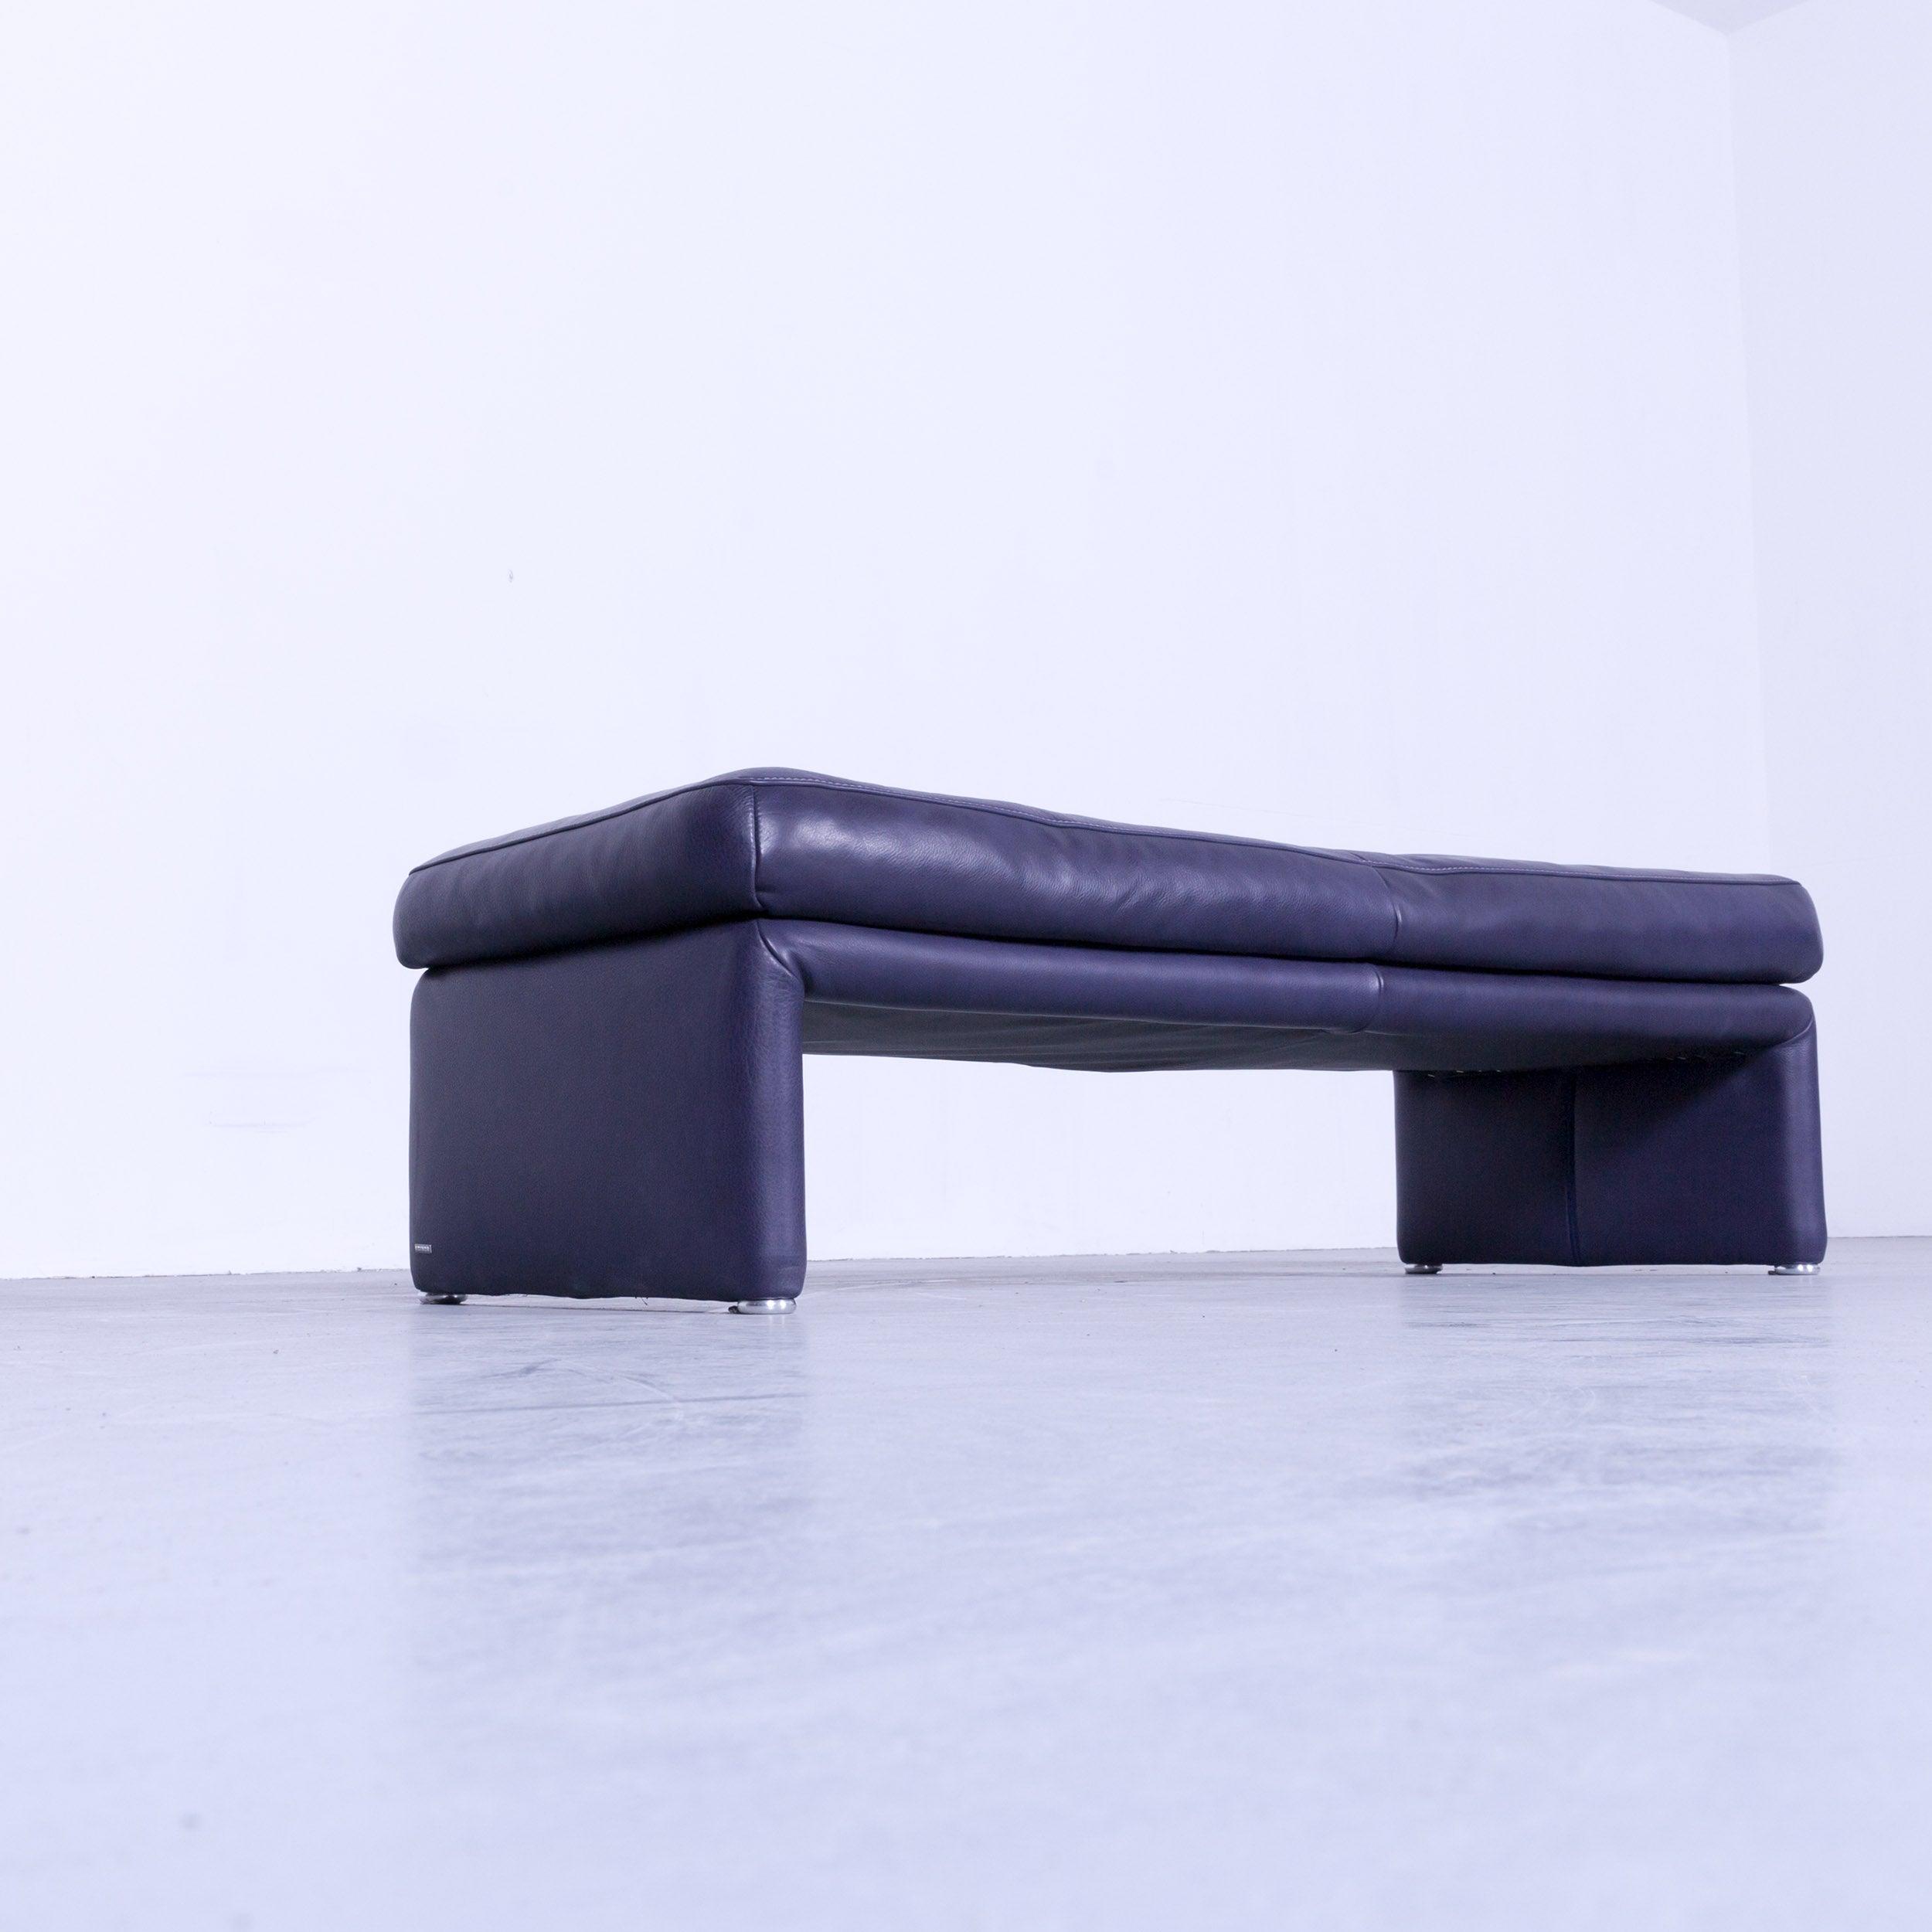 Koinor Raoul Designer Footstool Purple Eggplant Colored Leather Footrest Pouf